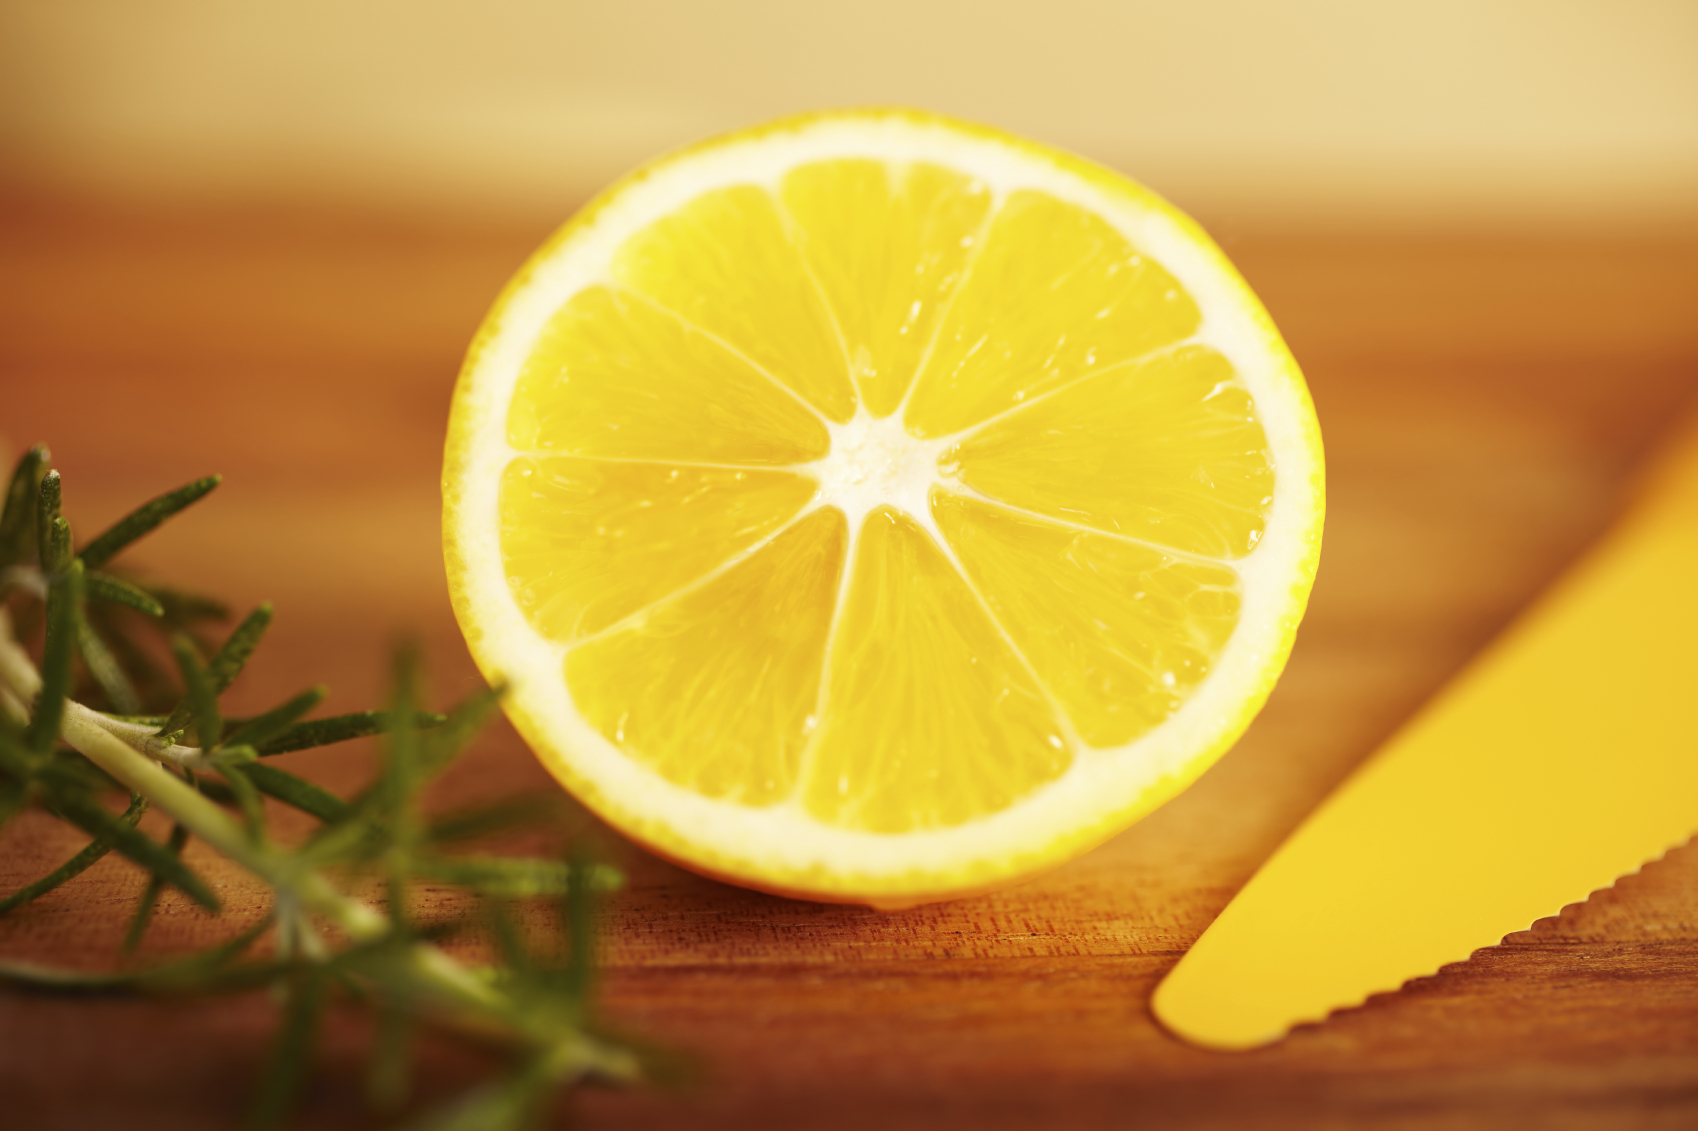 Lemon Juice - home remedy for tonsil stones